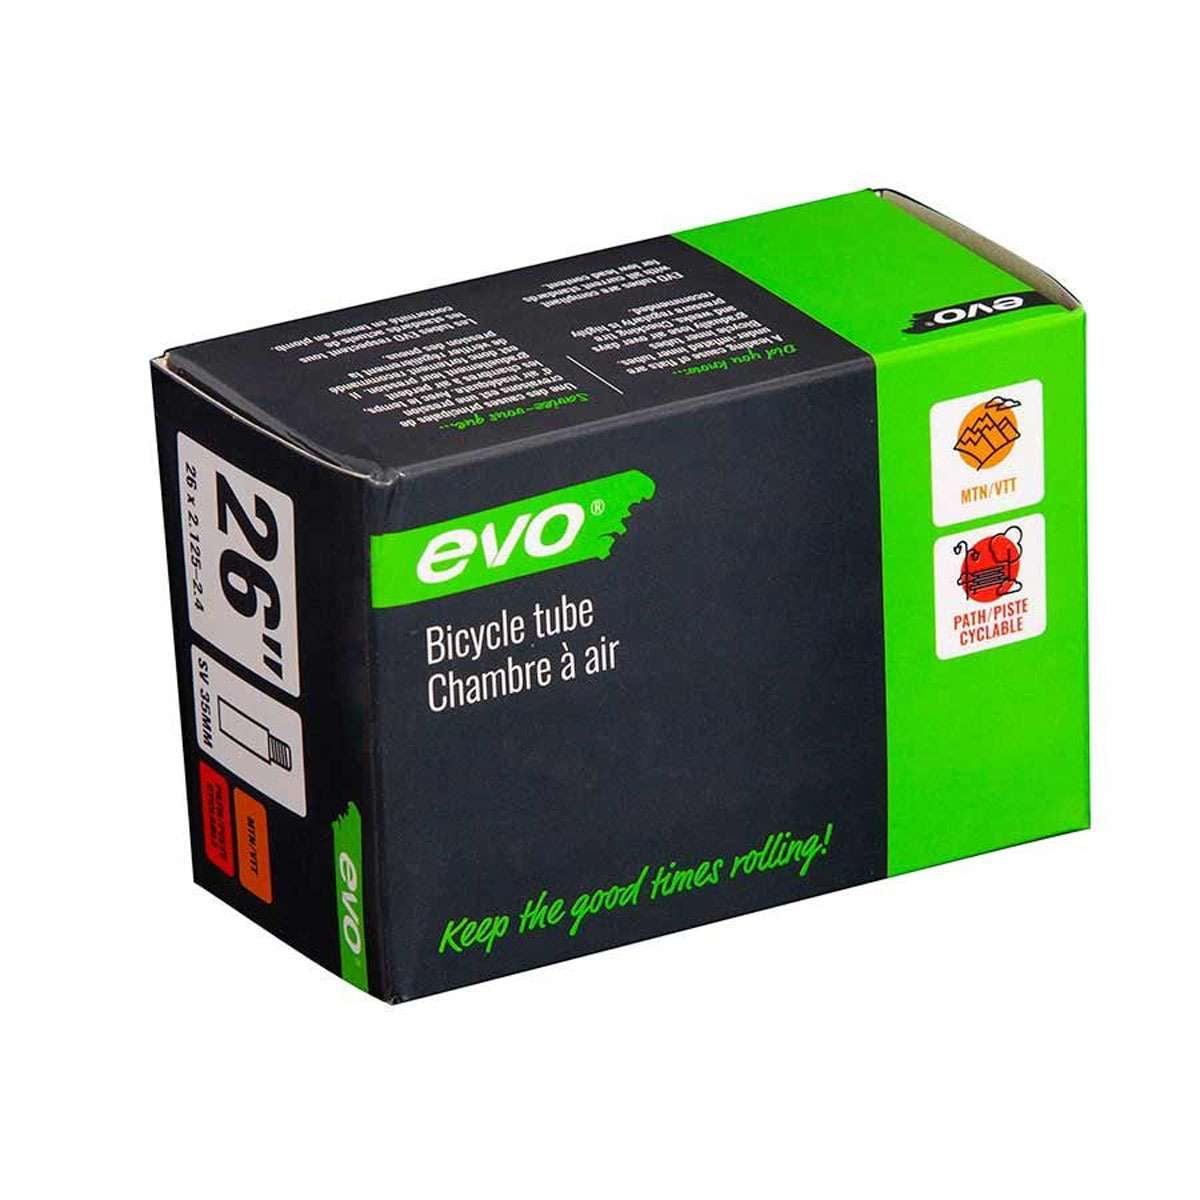 Evo Bicycle Tube - Schrader, 35mm, 26', 2.125-2.40 - 14EV.020176-13